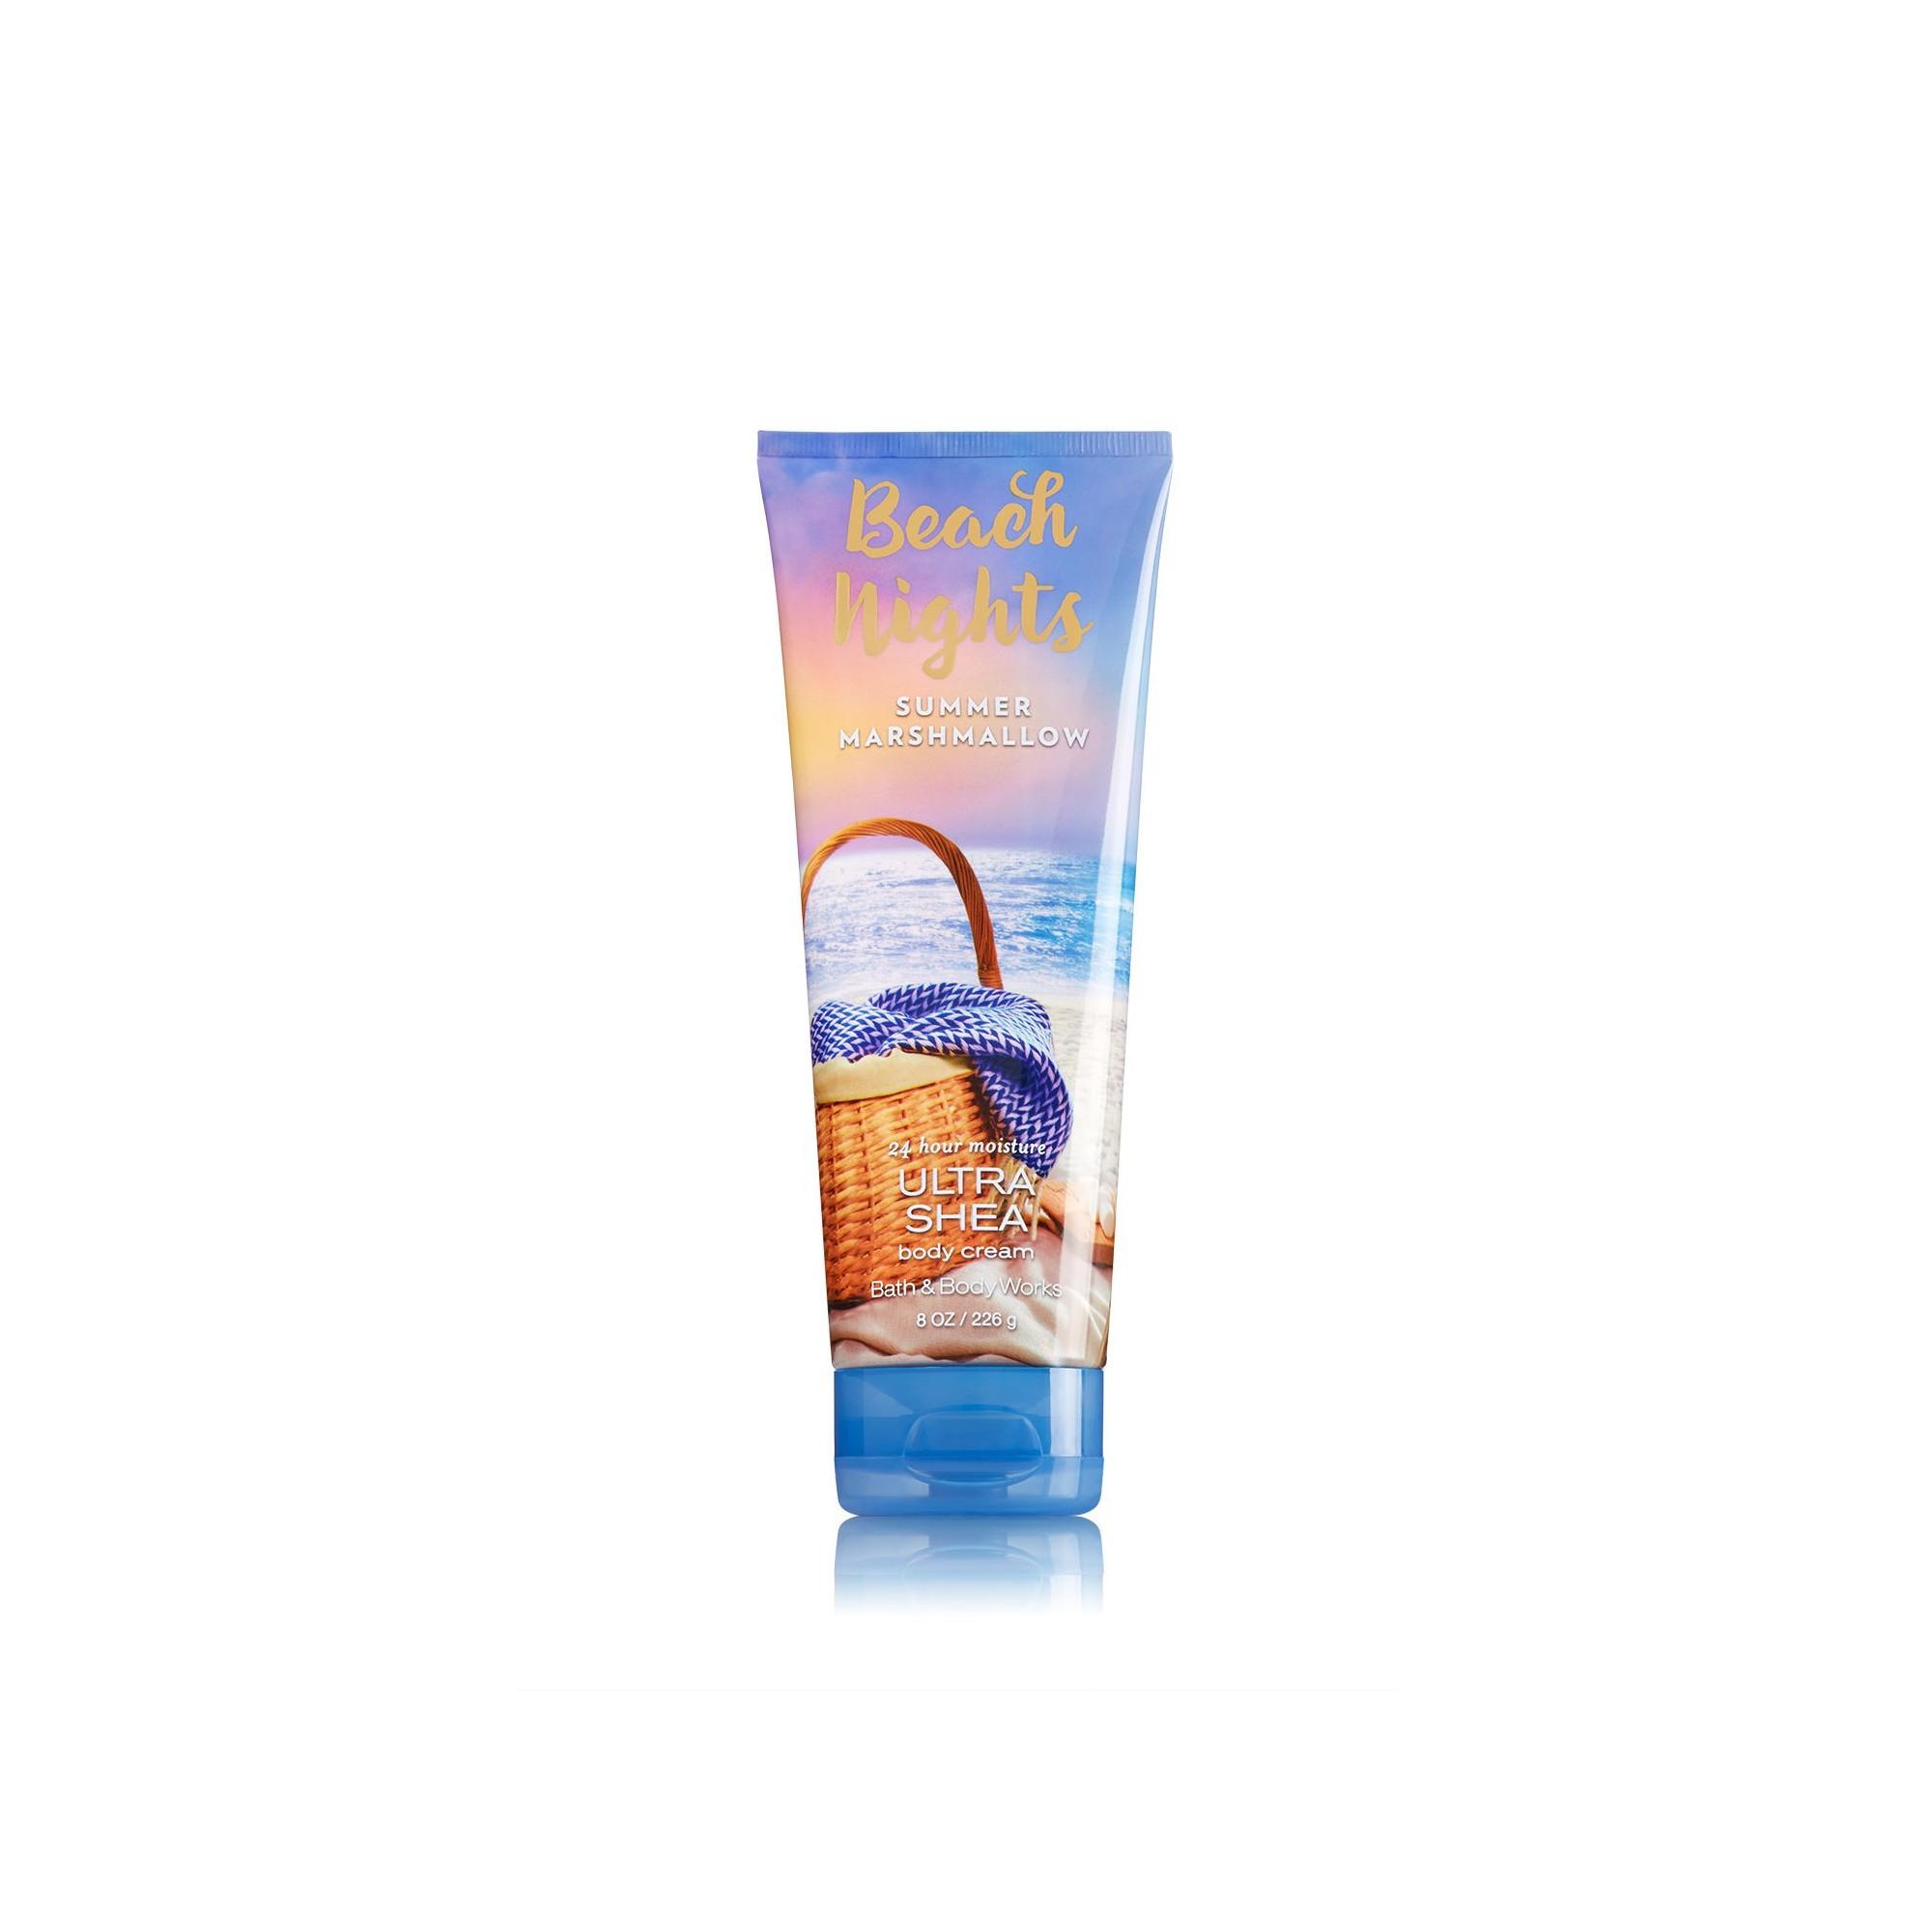 Bath & Body Works Summer Marshmallow Ultra Shea Body Cream